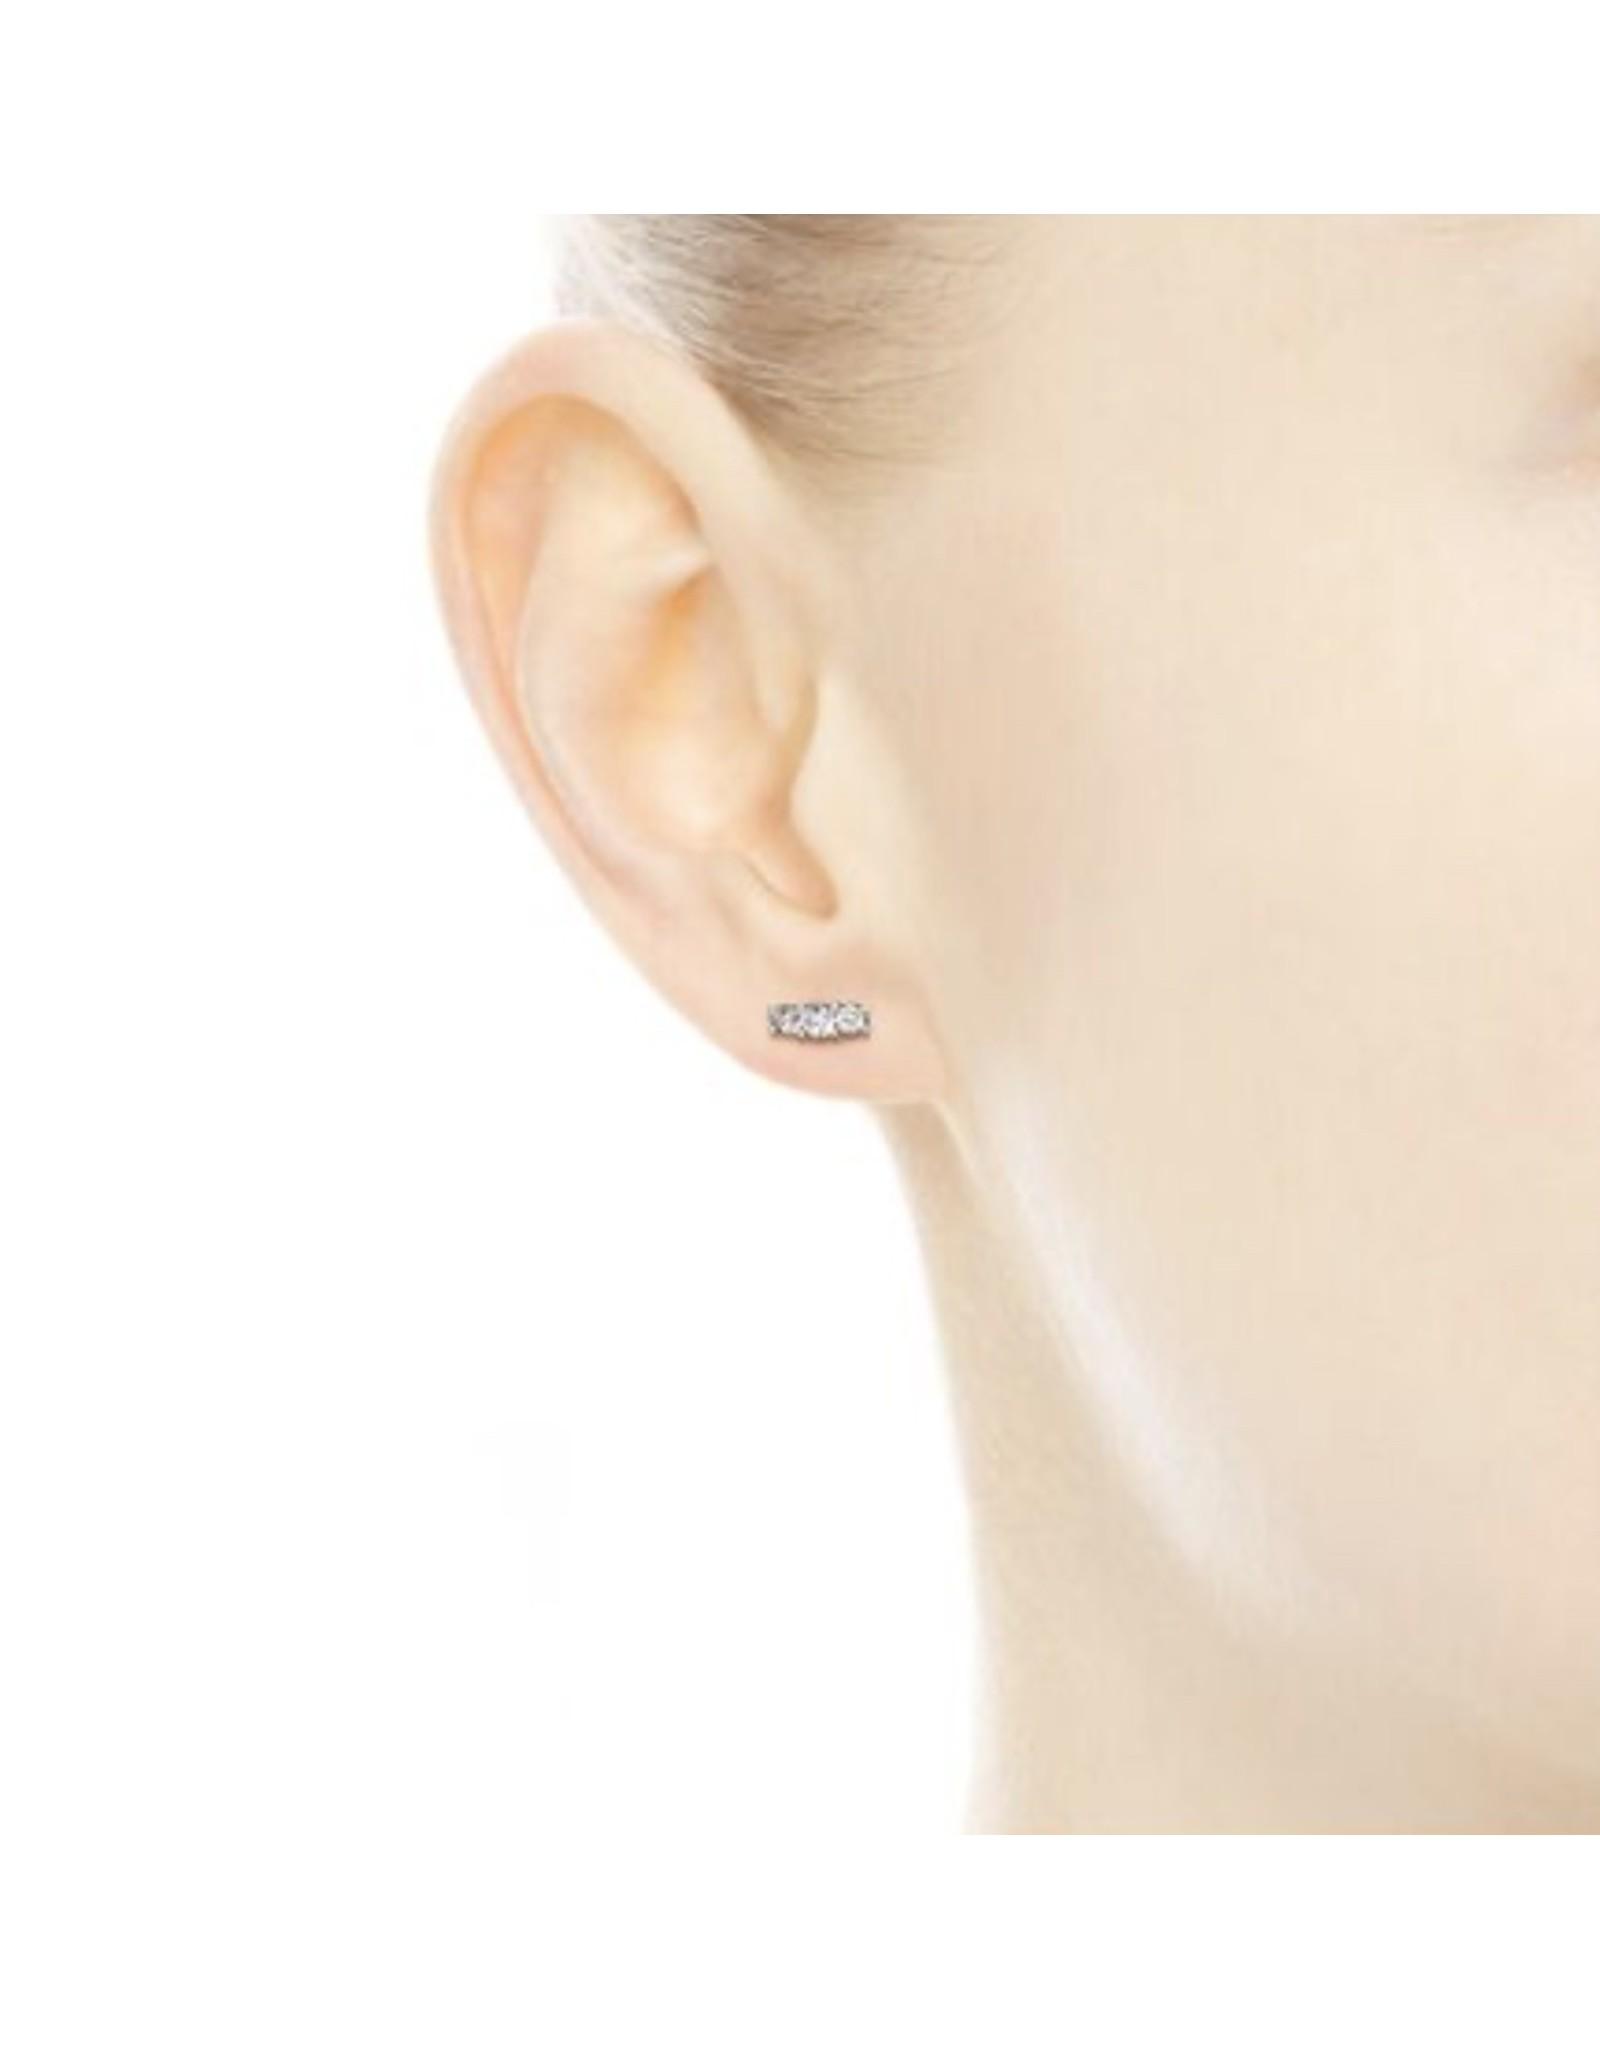 Pandora Pandora Earrings, 290725CZ,Sparkling Stud, Sterling Silver Clear CZ